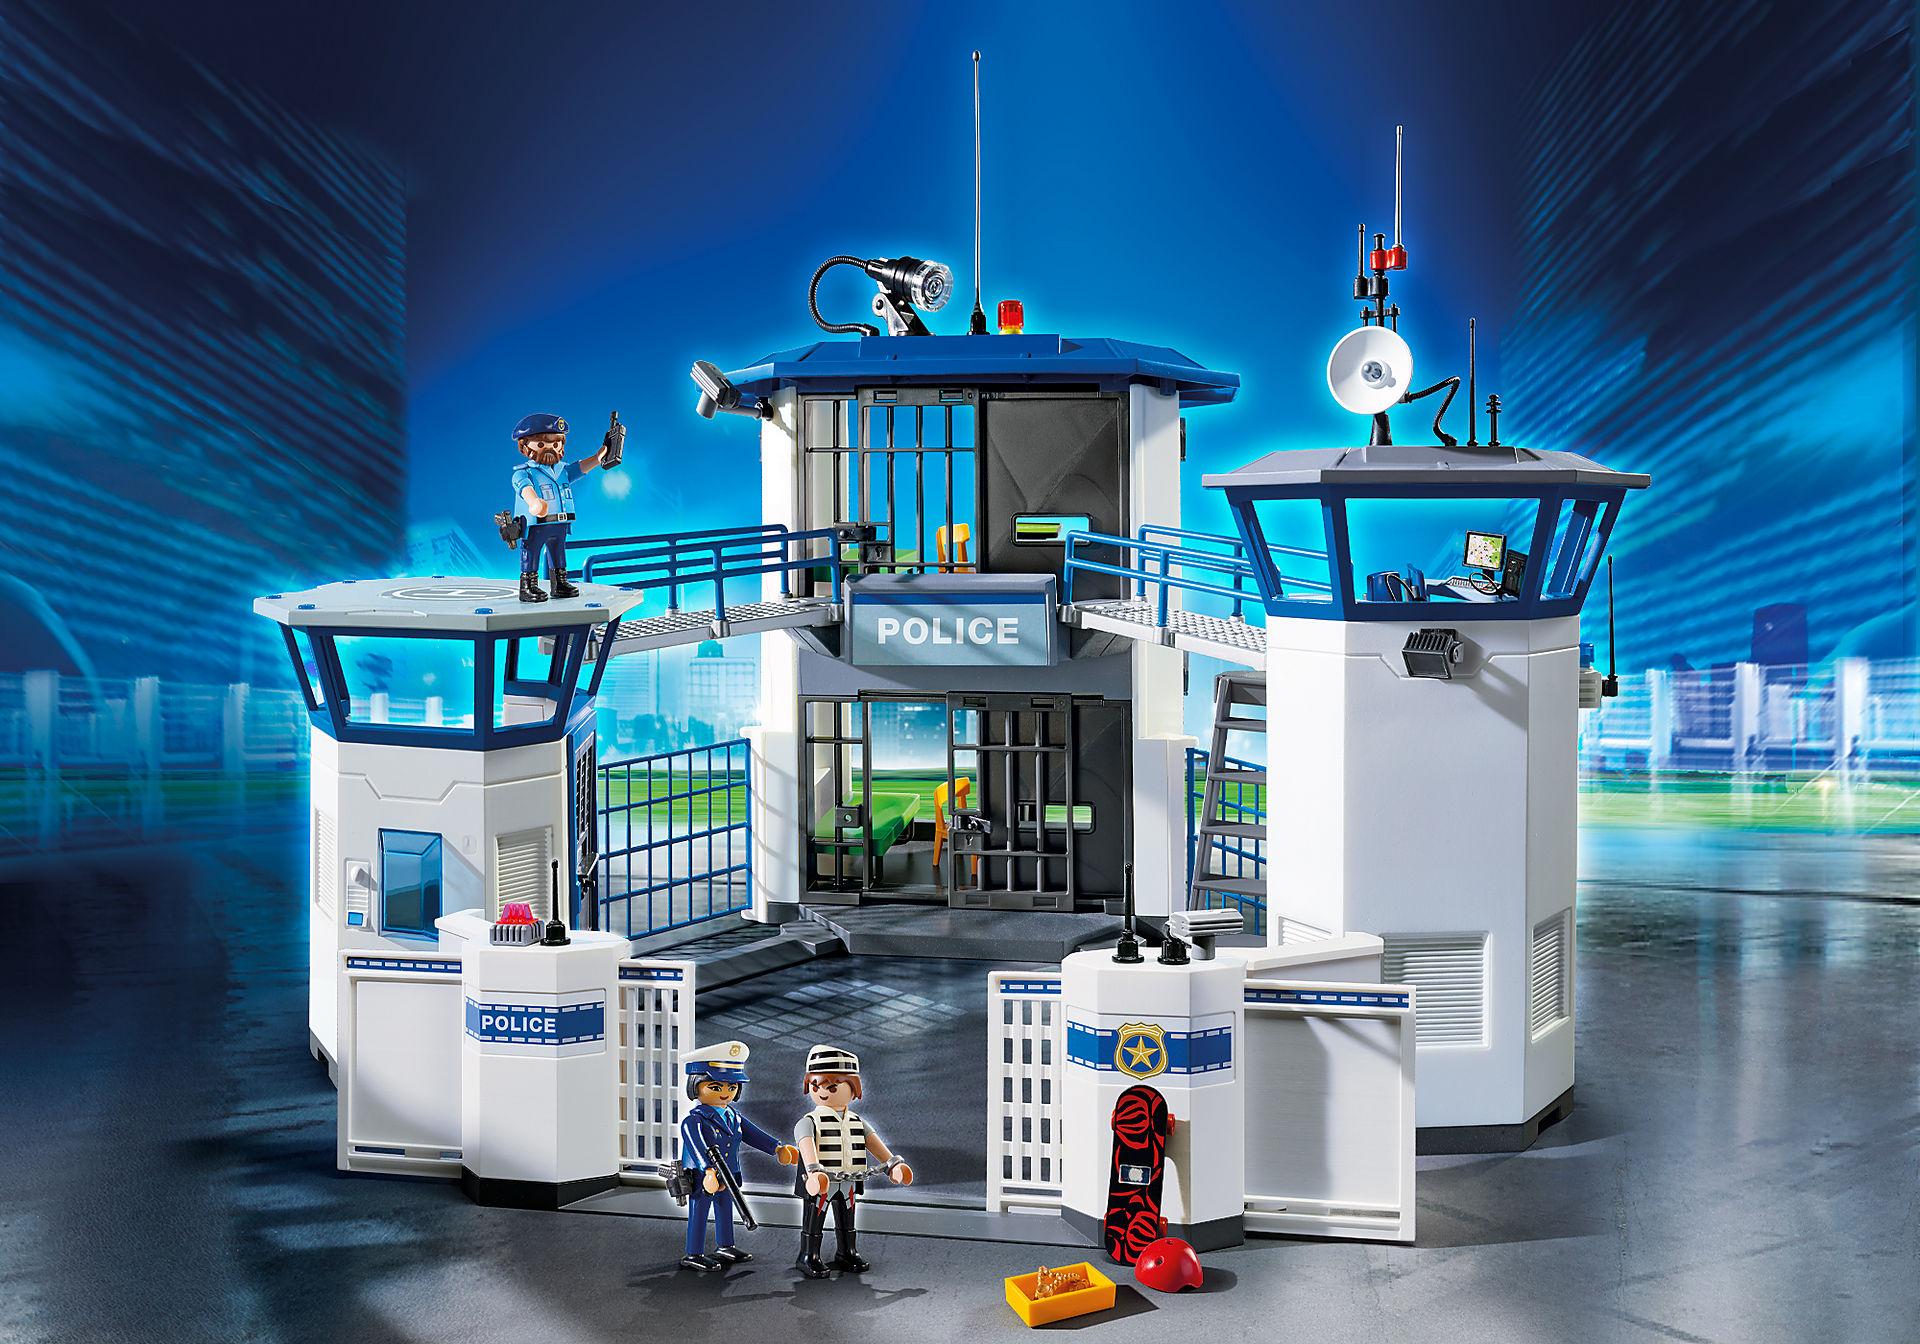 http://media.playmobil.com/i/playmobil/6872_product_detail/Polizei-Kommandozentrale mit Gefängnis